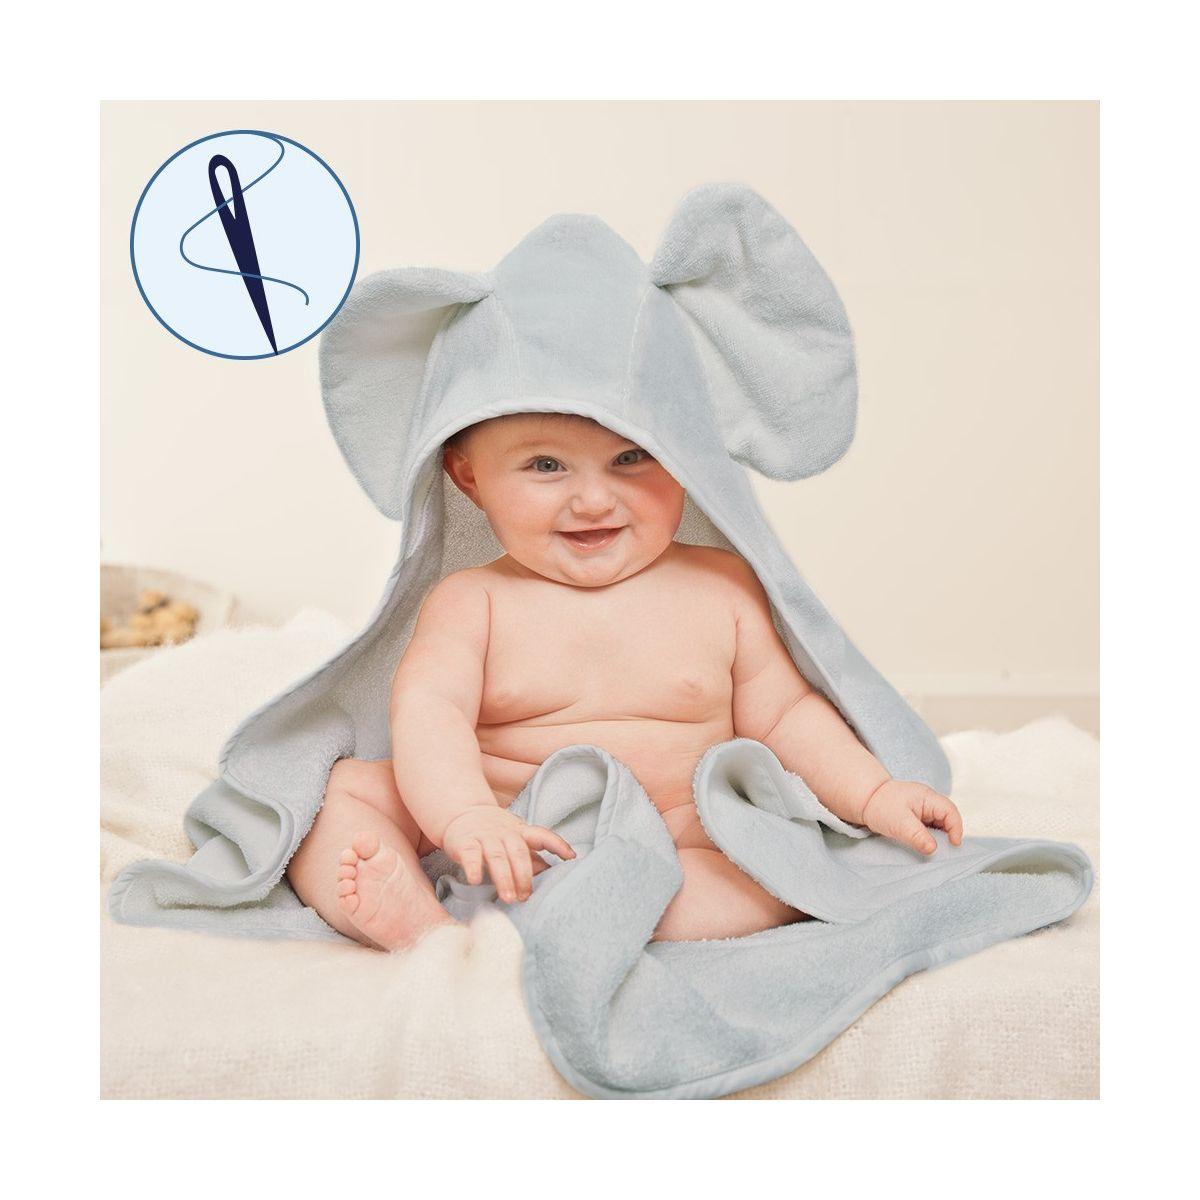 469058471 Toalla para Bebés Elefante Gris con Capucha